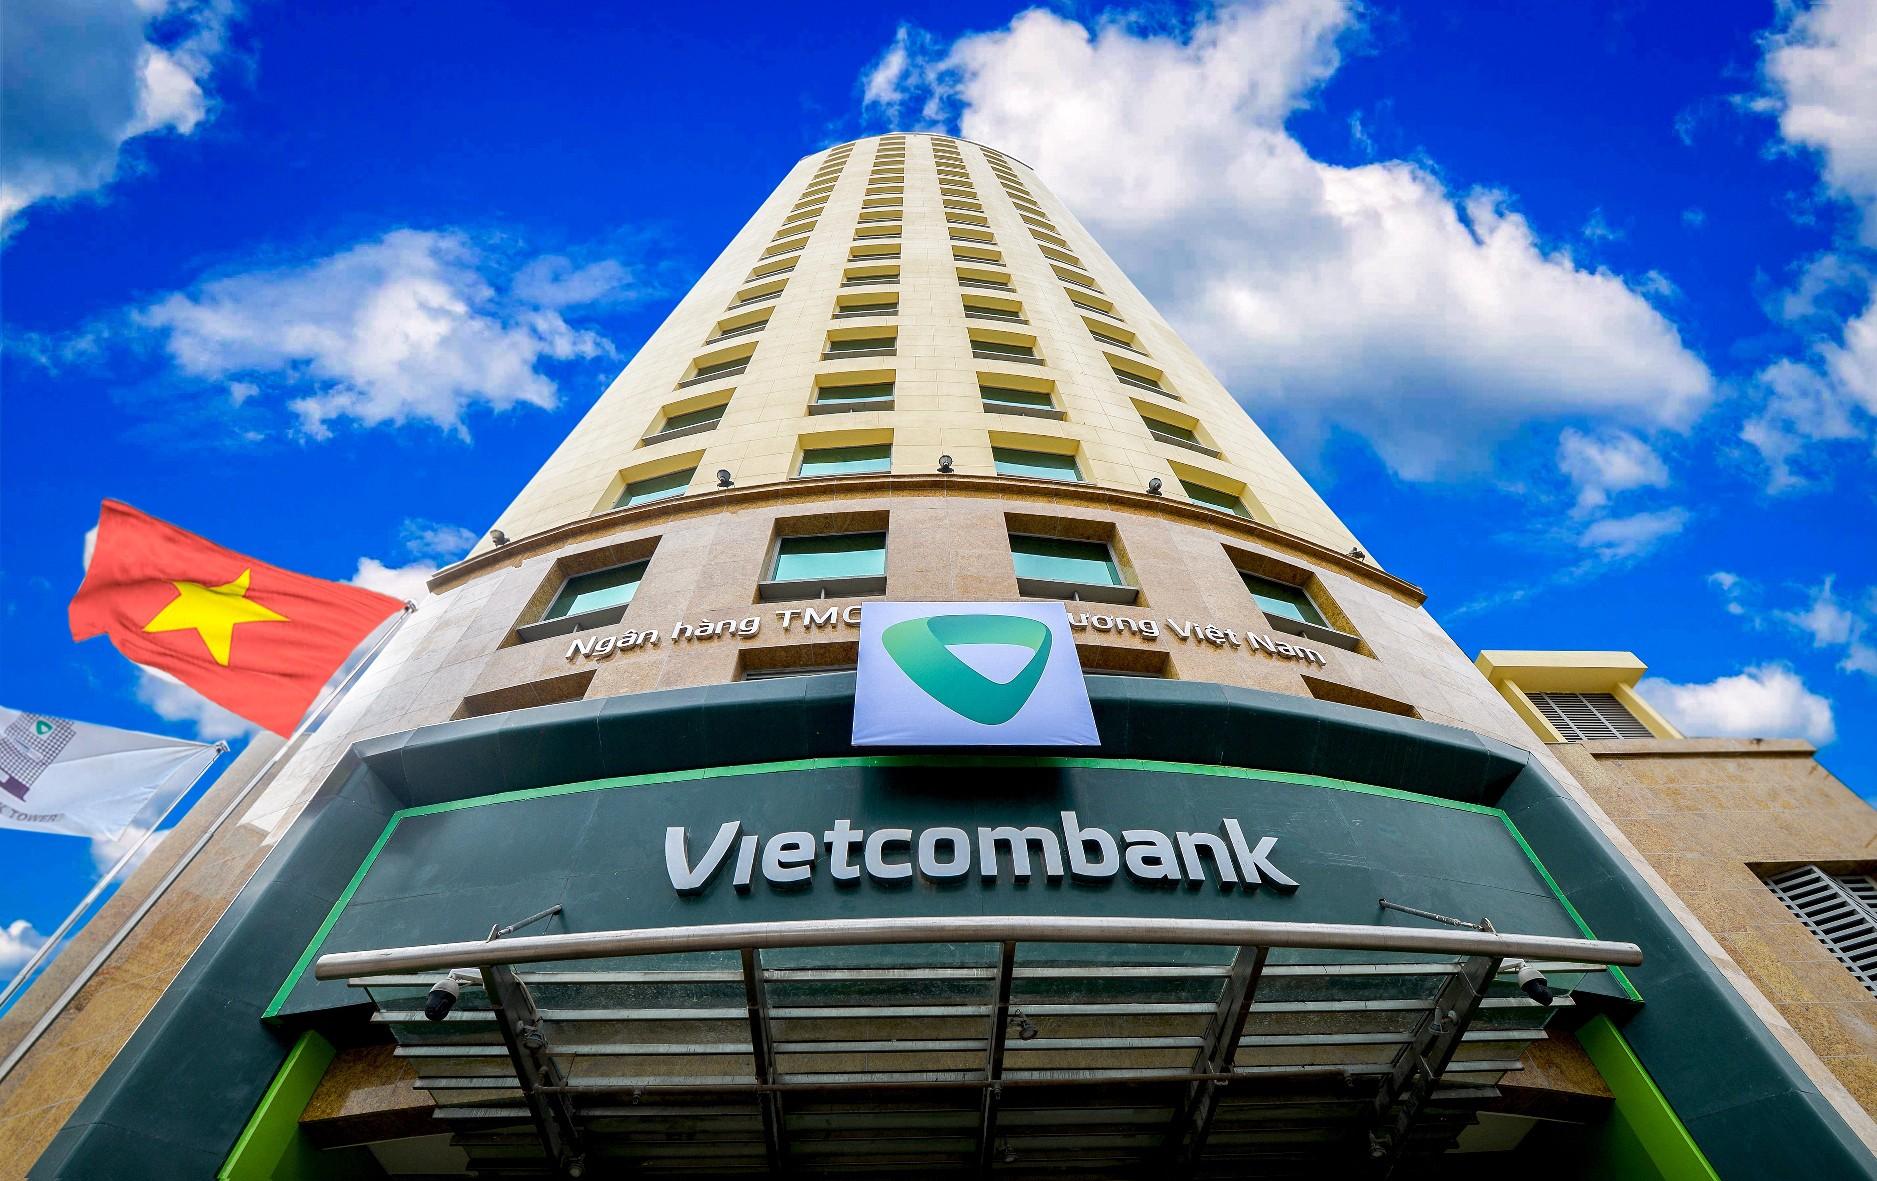 vietcombank-toa-nha-tru-so-chinh-1-1615268851.jpg